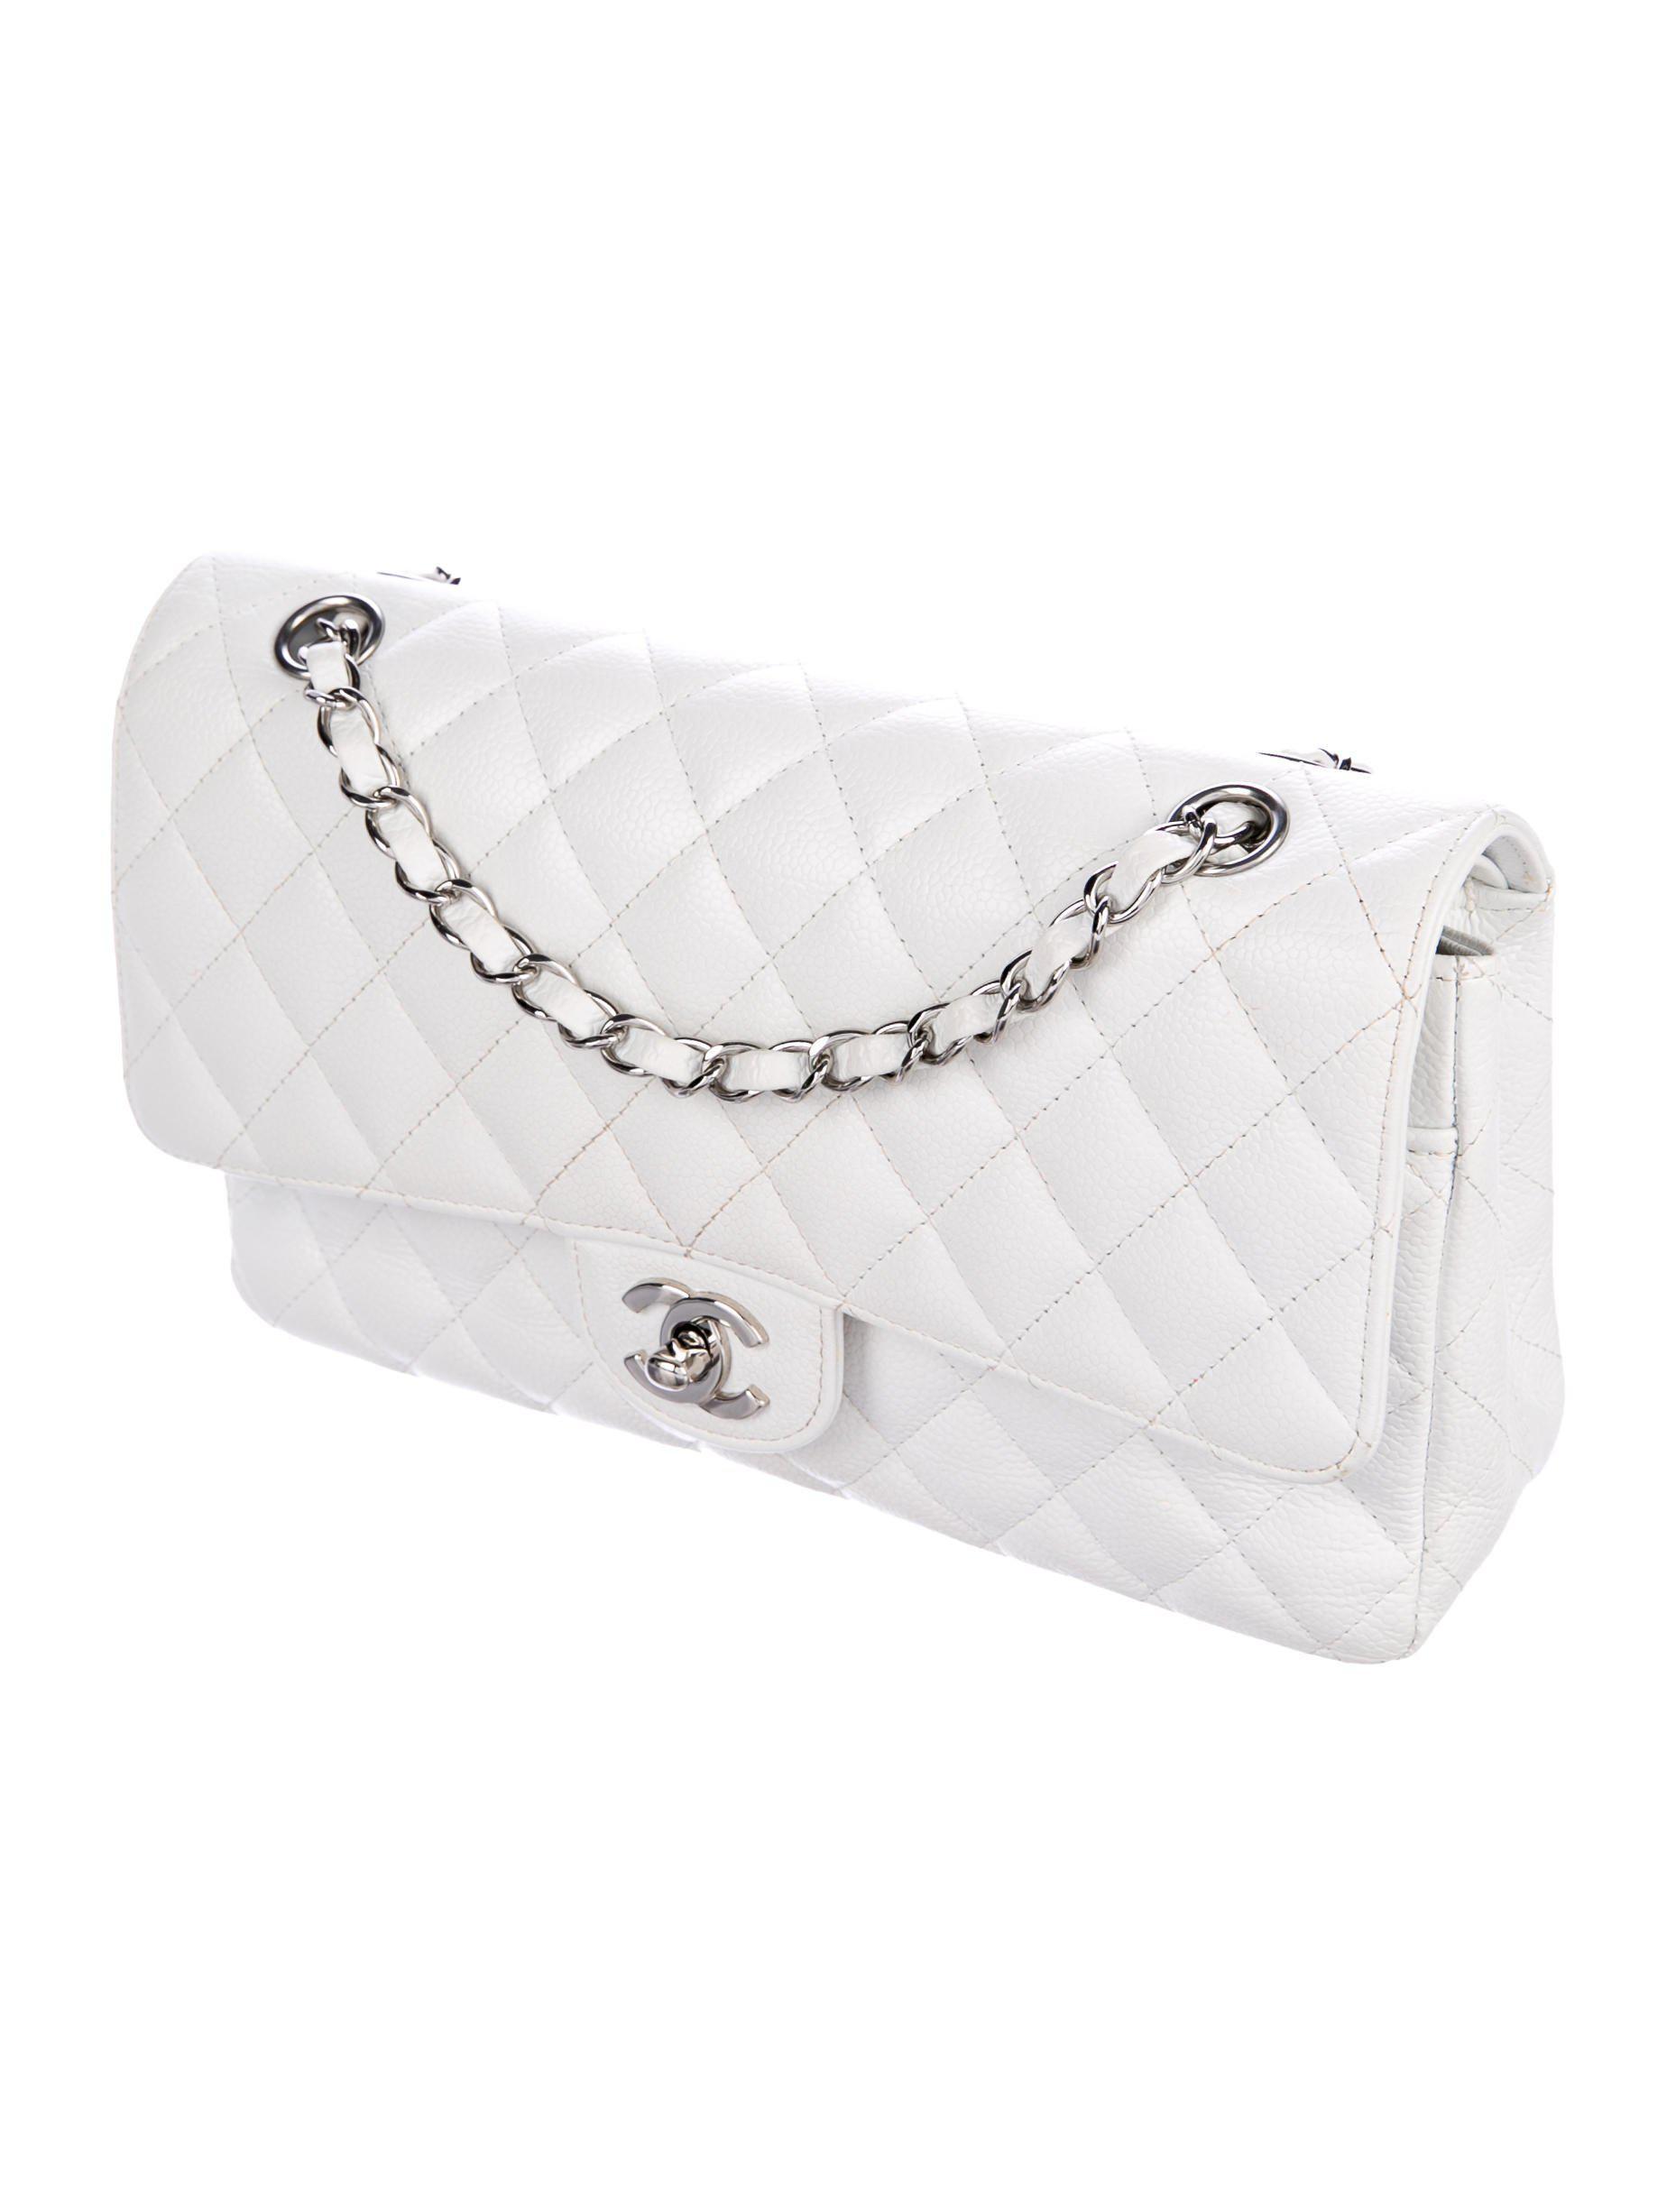 395ff15bc656 Lyst - Chanel Caviar Classic Medium Double Flap Bag White in Metallic